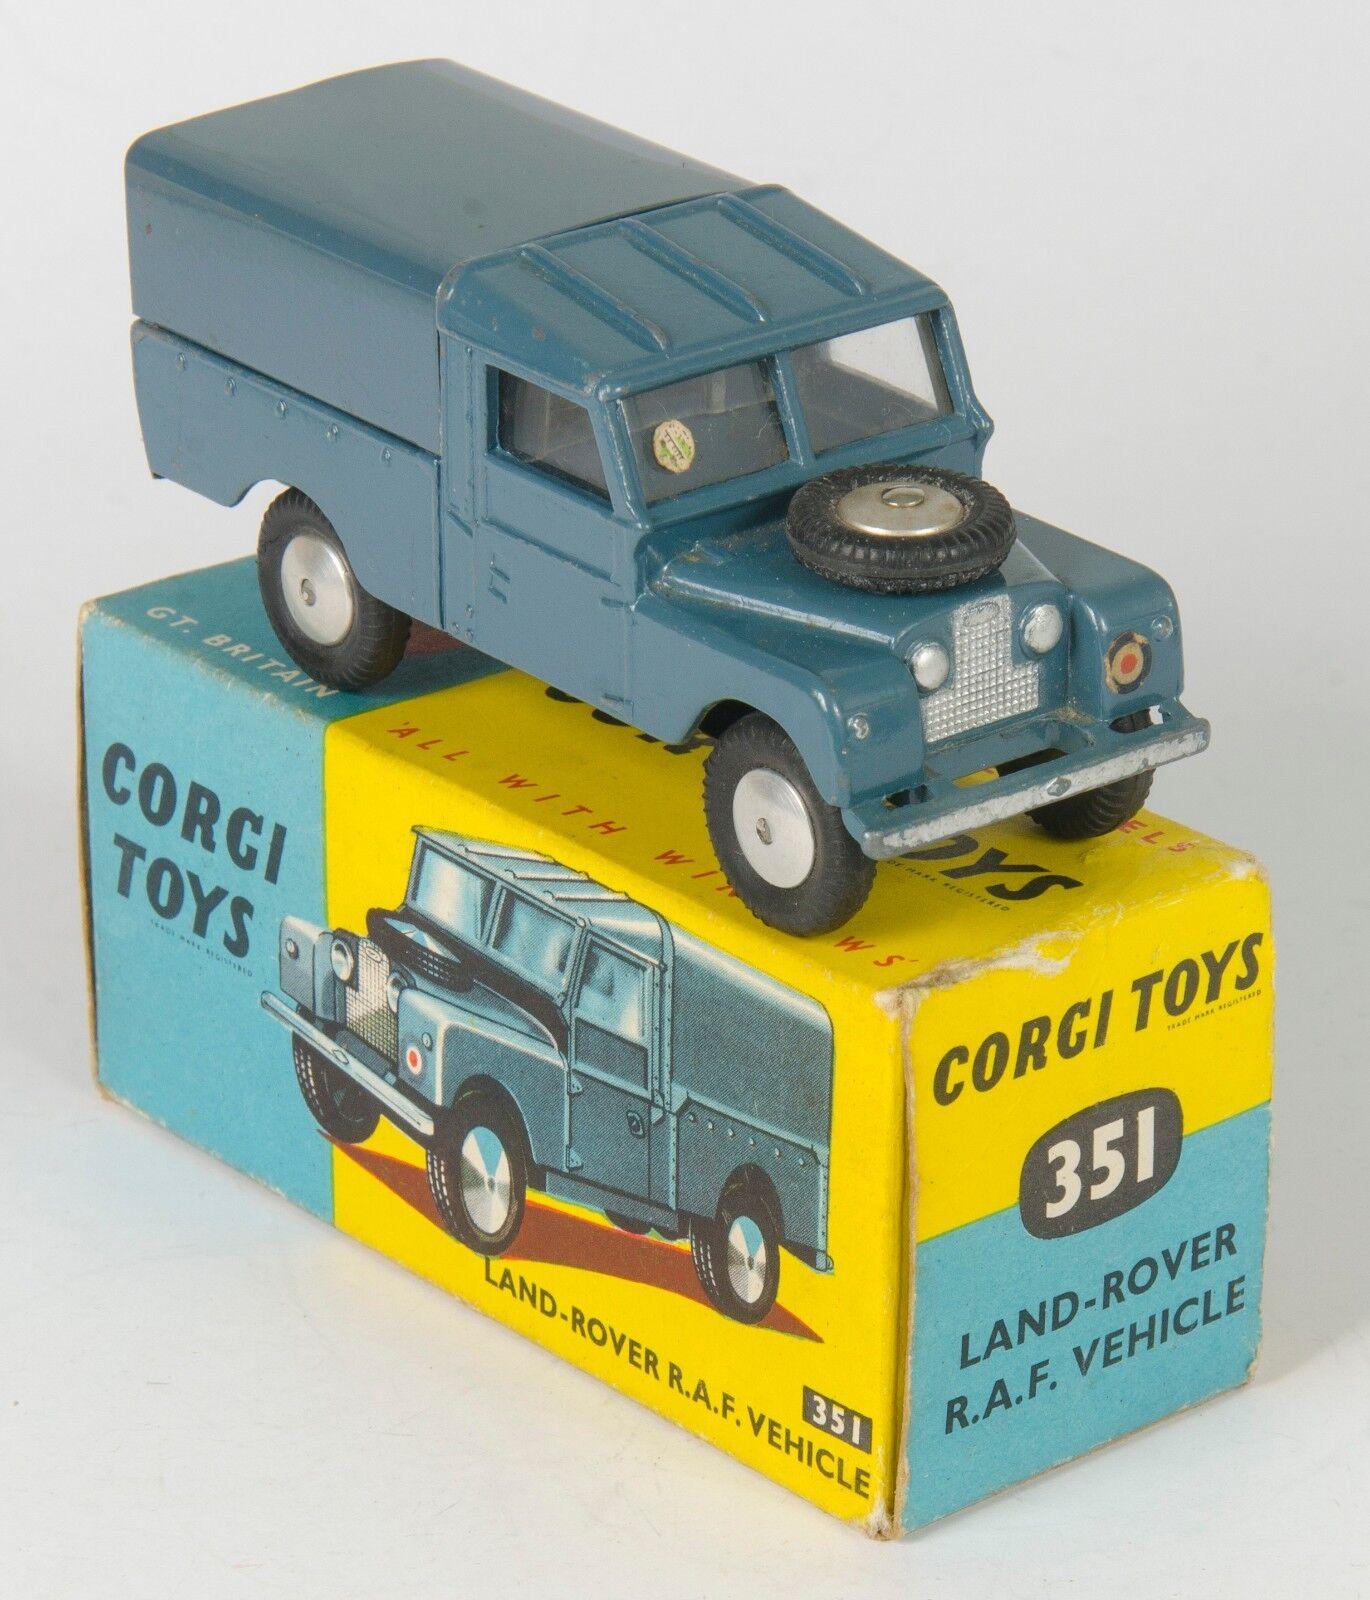 Corgi 351 Land-Rover R.A.F. Vehicle. bluee. Near-MINT Boxed. 1950's